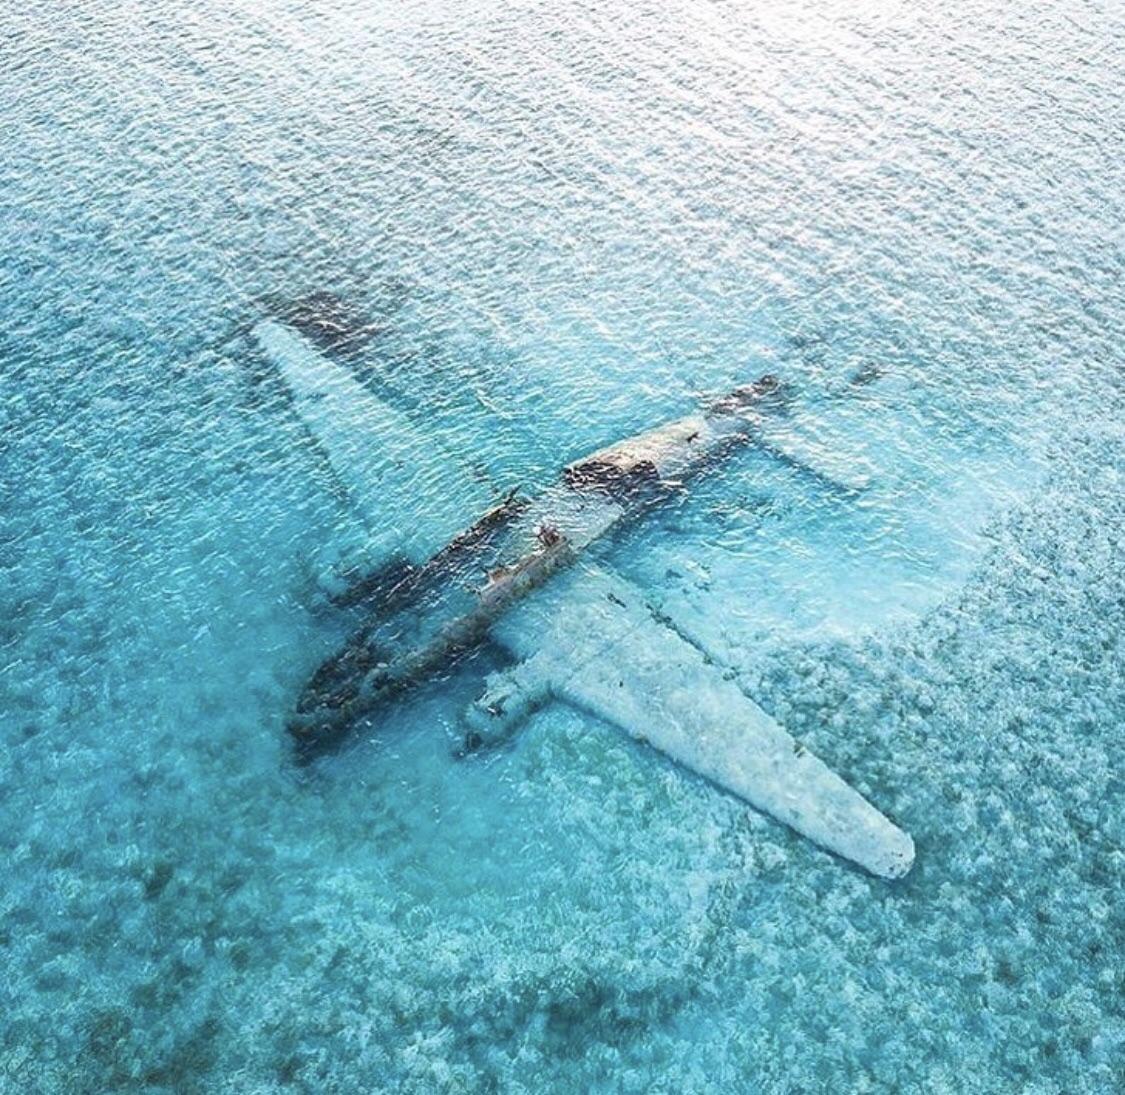 Pablo Escobar's Sunken Drug Plane Normans Cay, Exuma